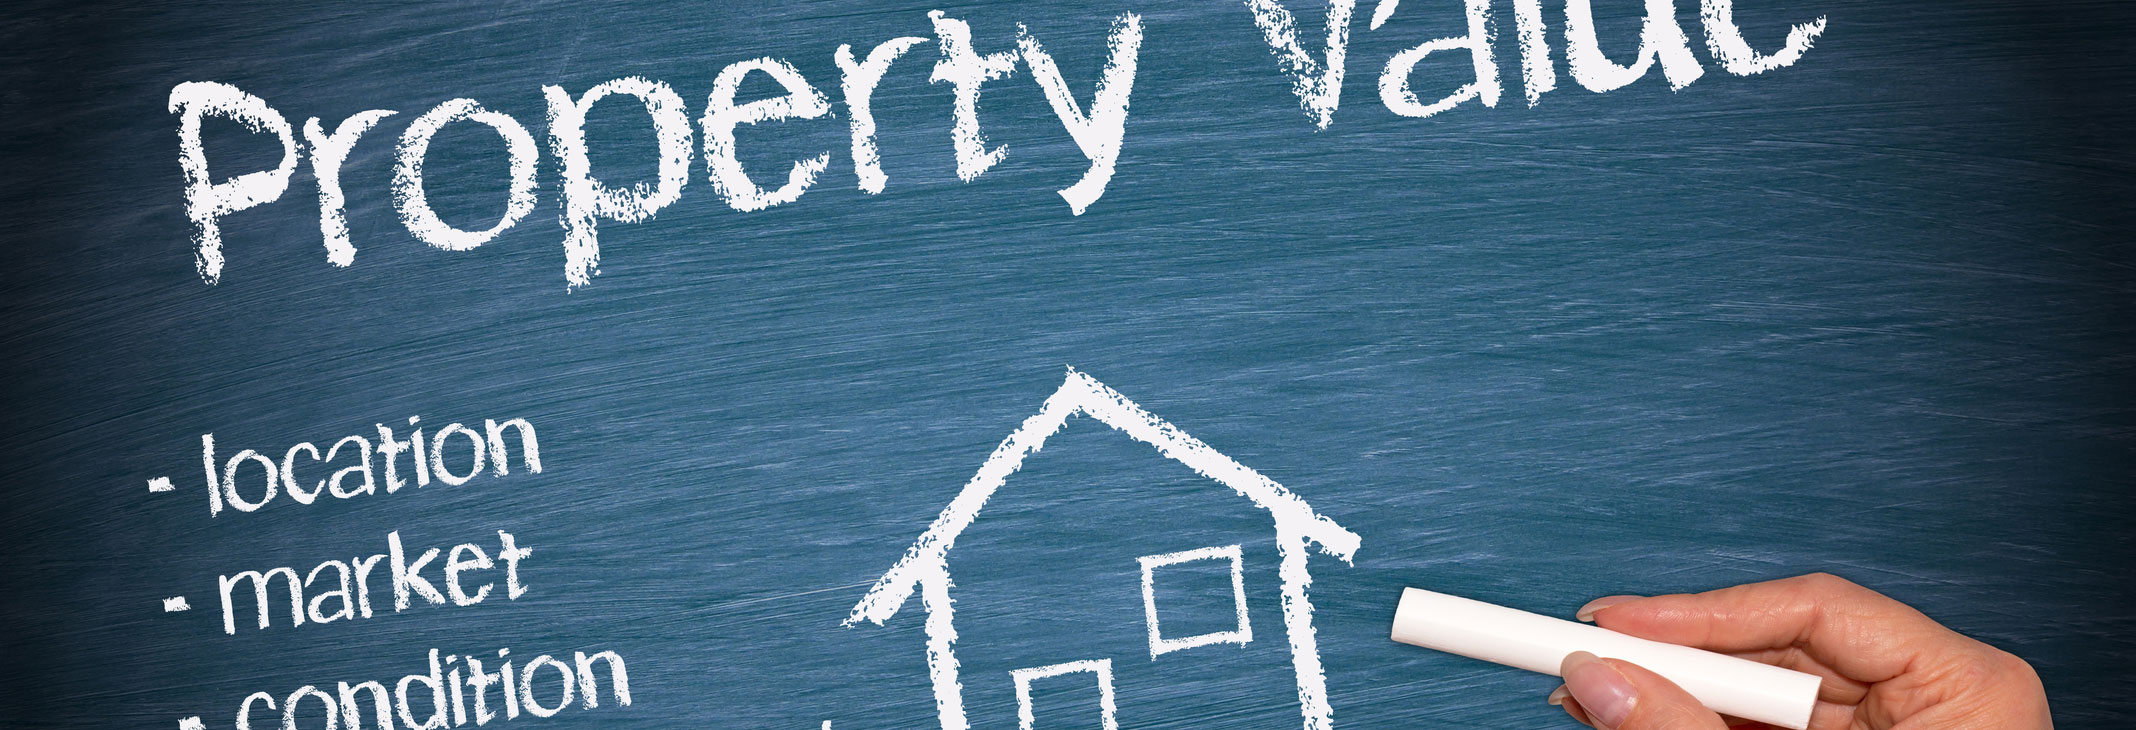 Property value, location, market, condition